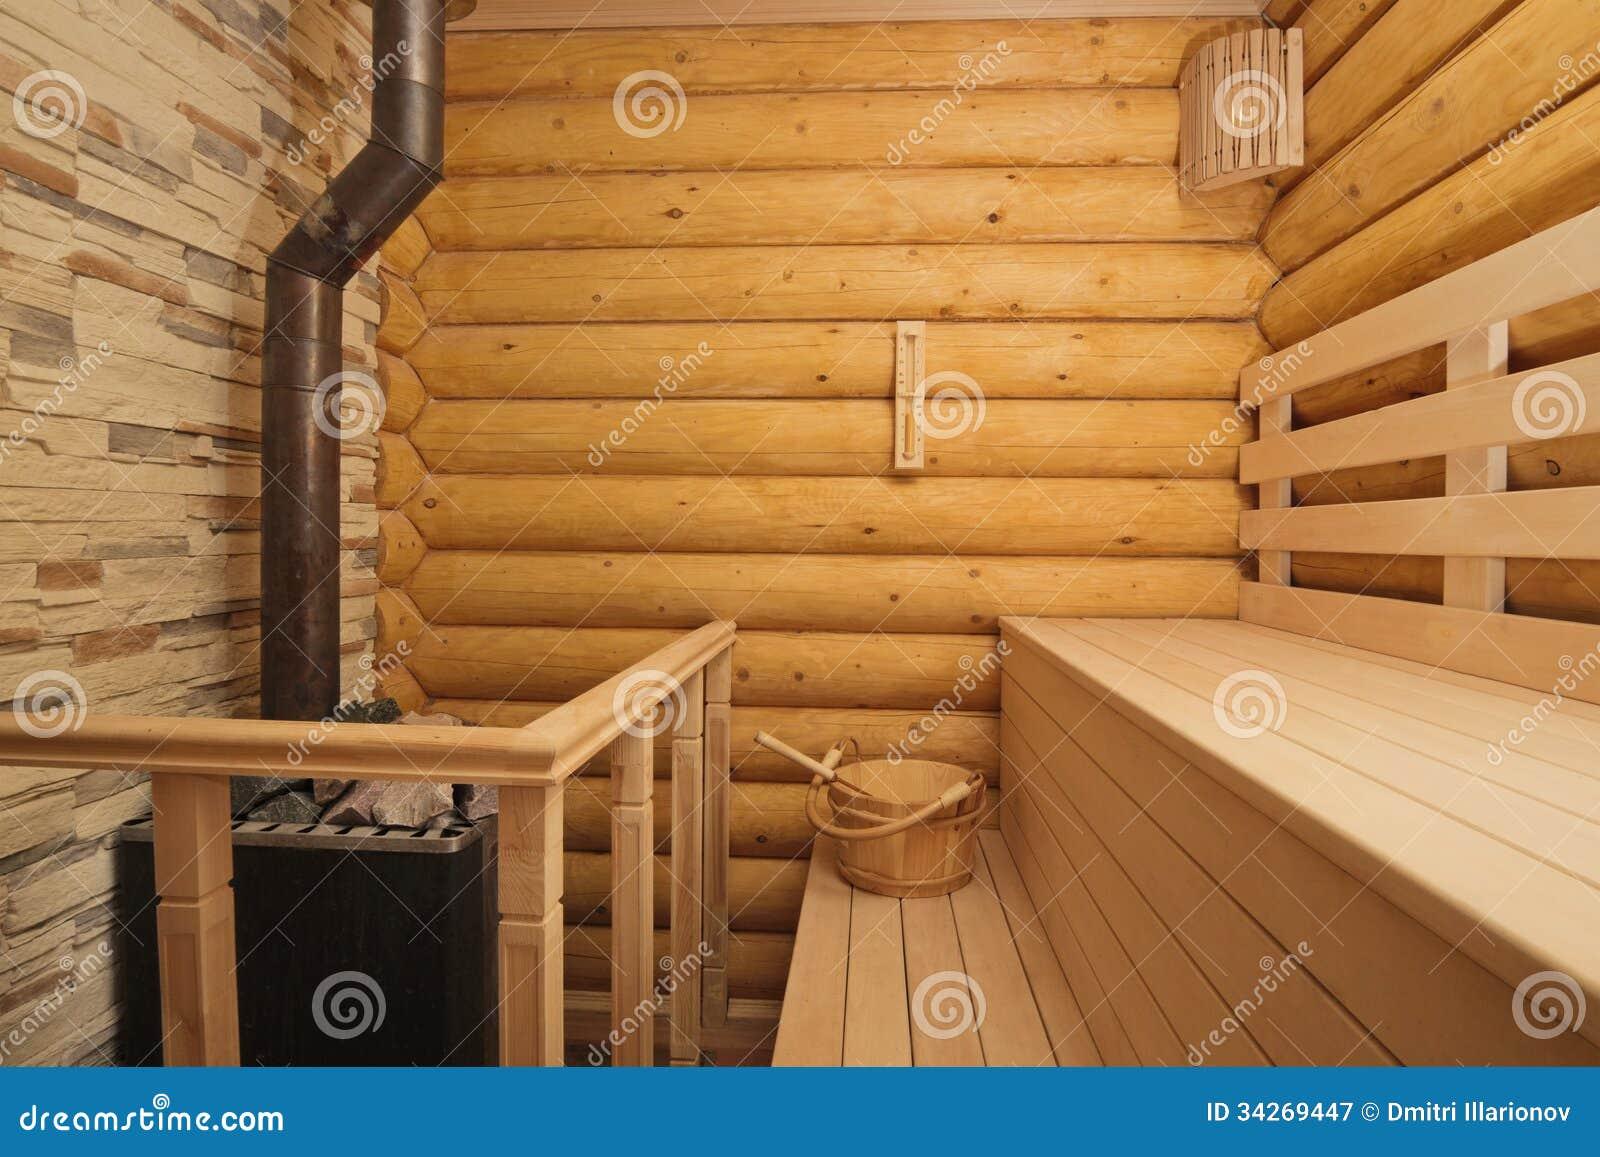 Log Sauna With Heater Stock Image Image Of Leisure